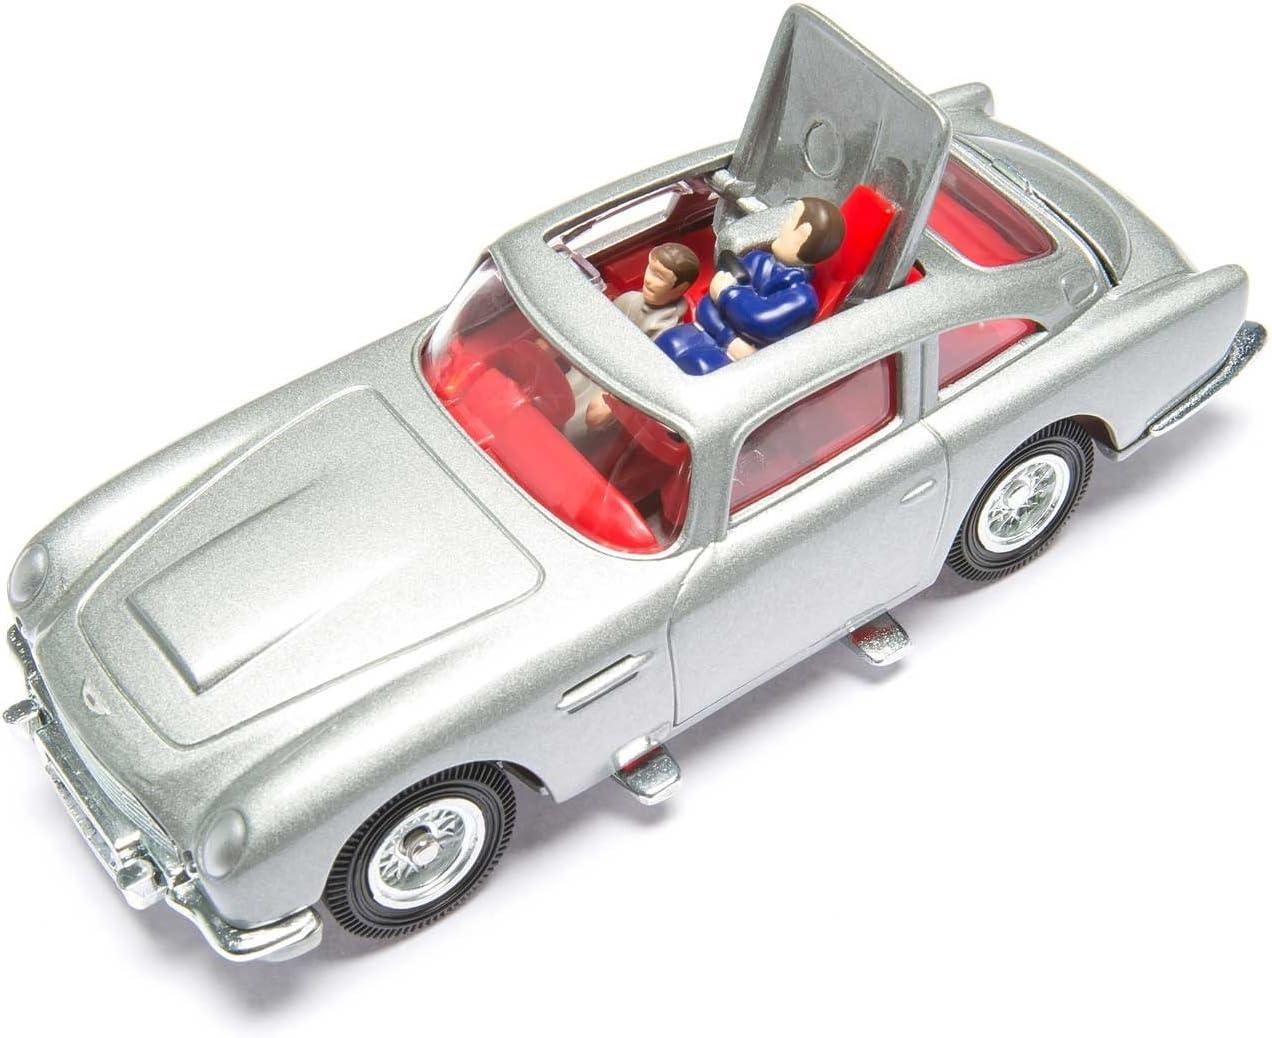 Corgi James Bond Aston Martin Db5 Silver Goldfinger 50th Anniversary Cc04203 Amazon Co Uk Toys Games